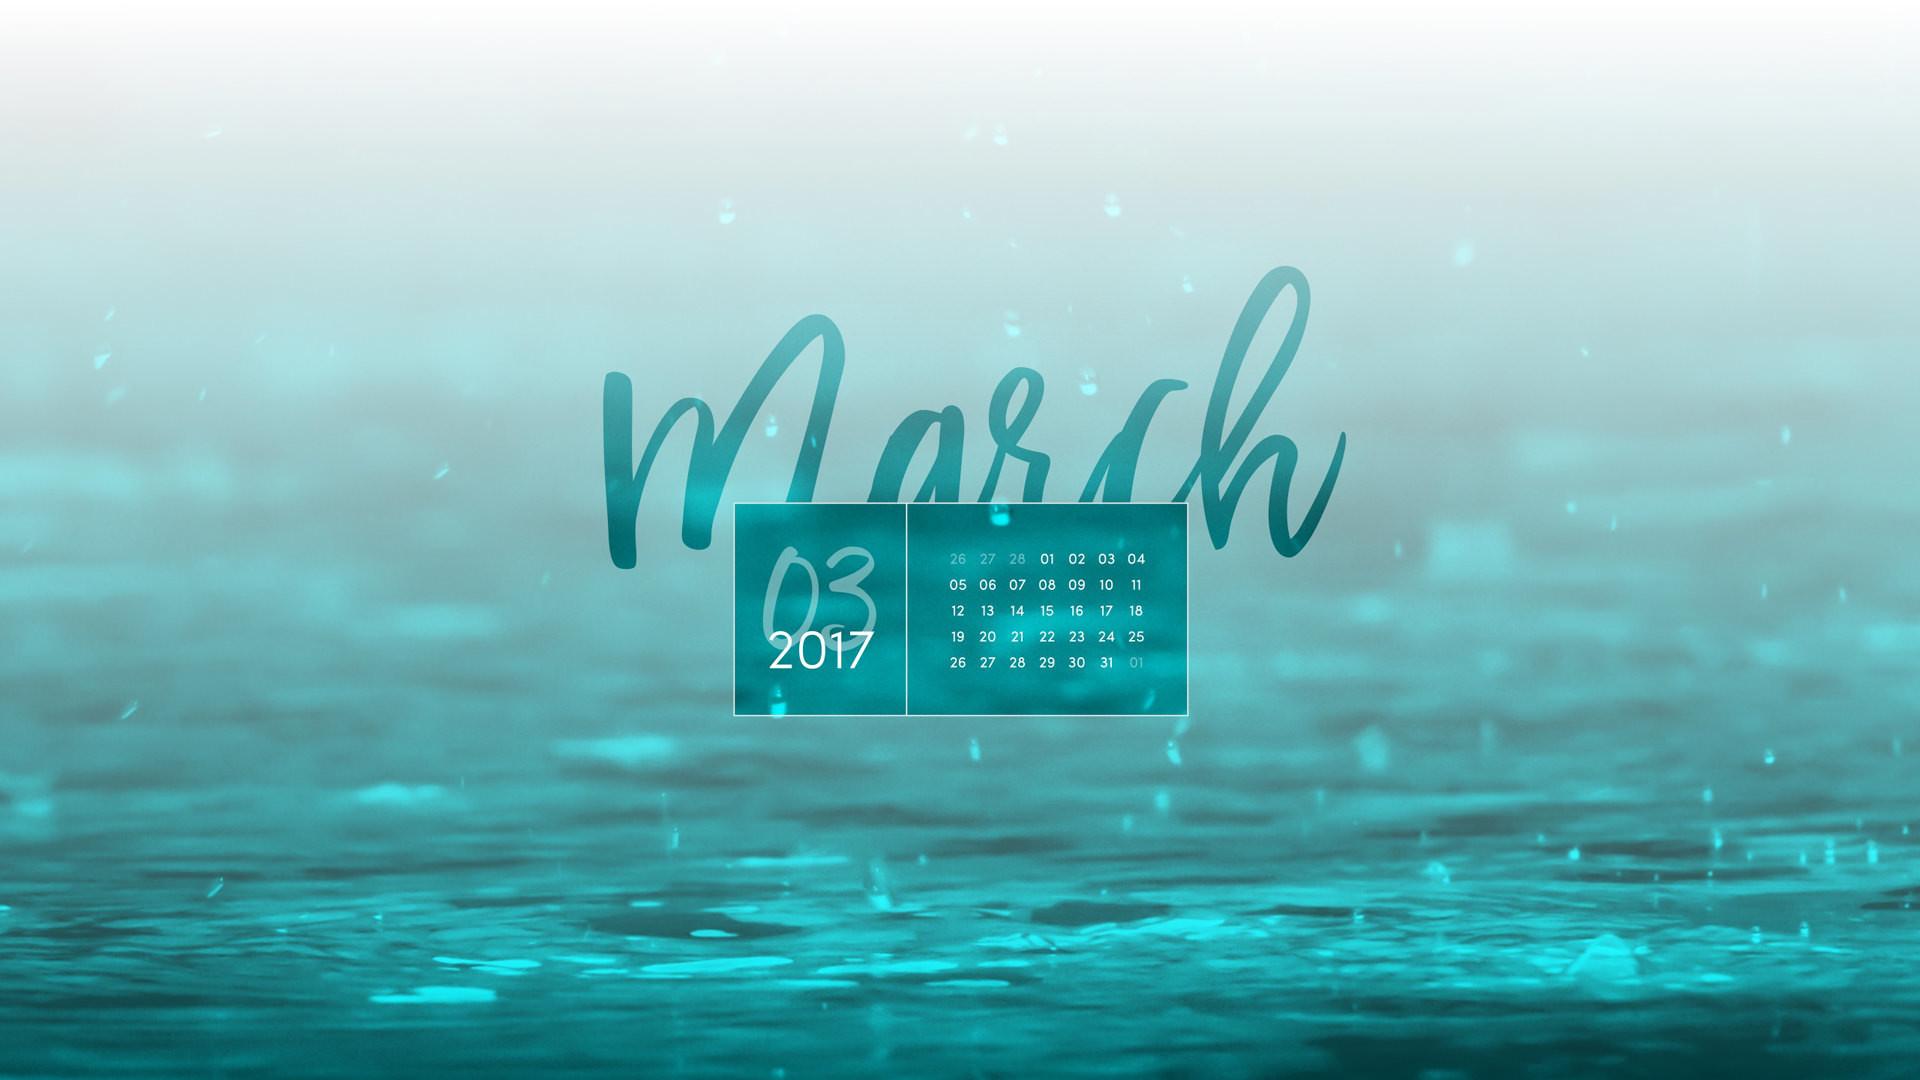 Res: 1920x1080, ... March 2017 Desktop Calendar Wallpaper: 2880X1800px · 2560X1600px ·  2560x1440px · 1920x1200px ...